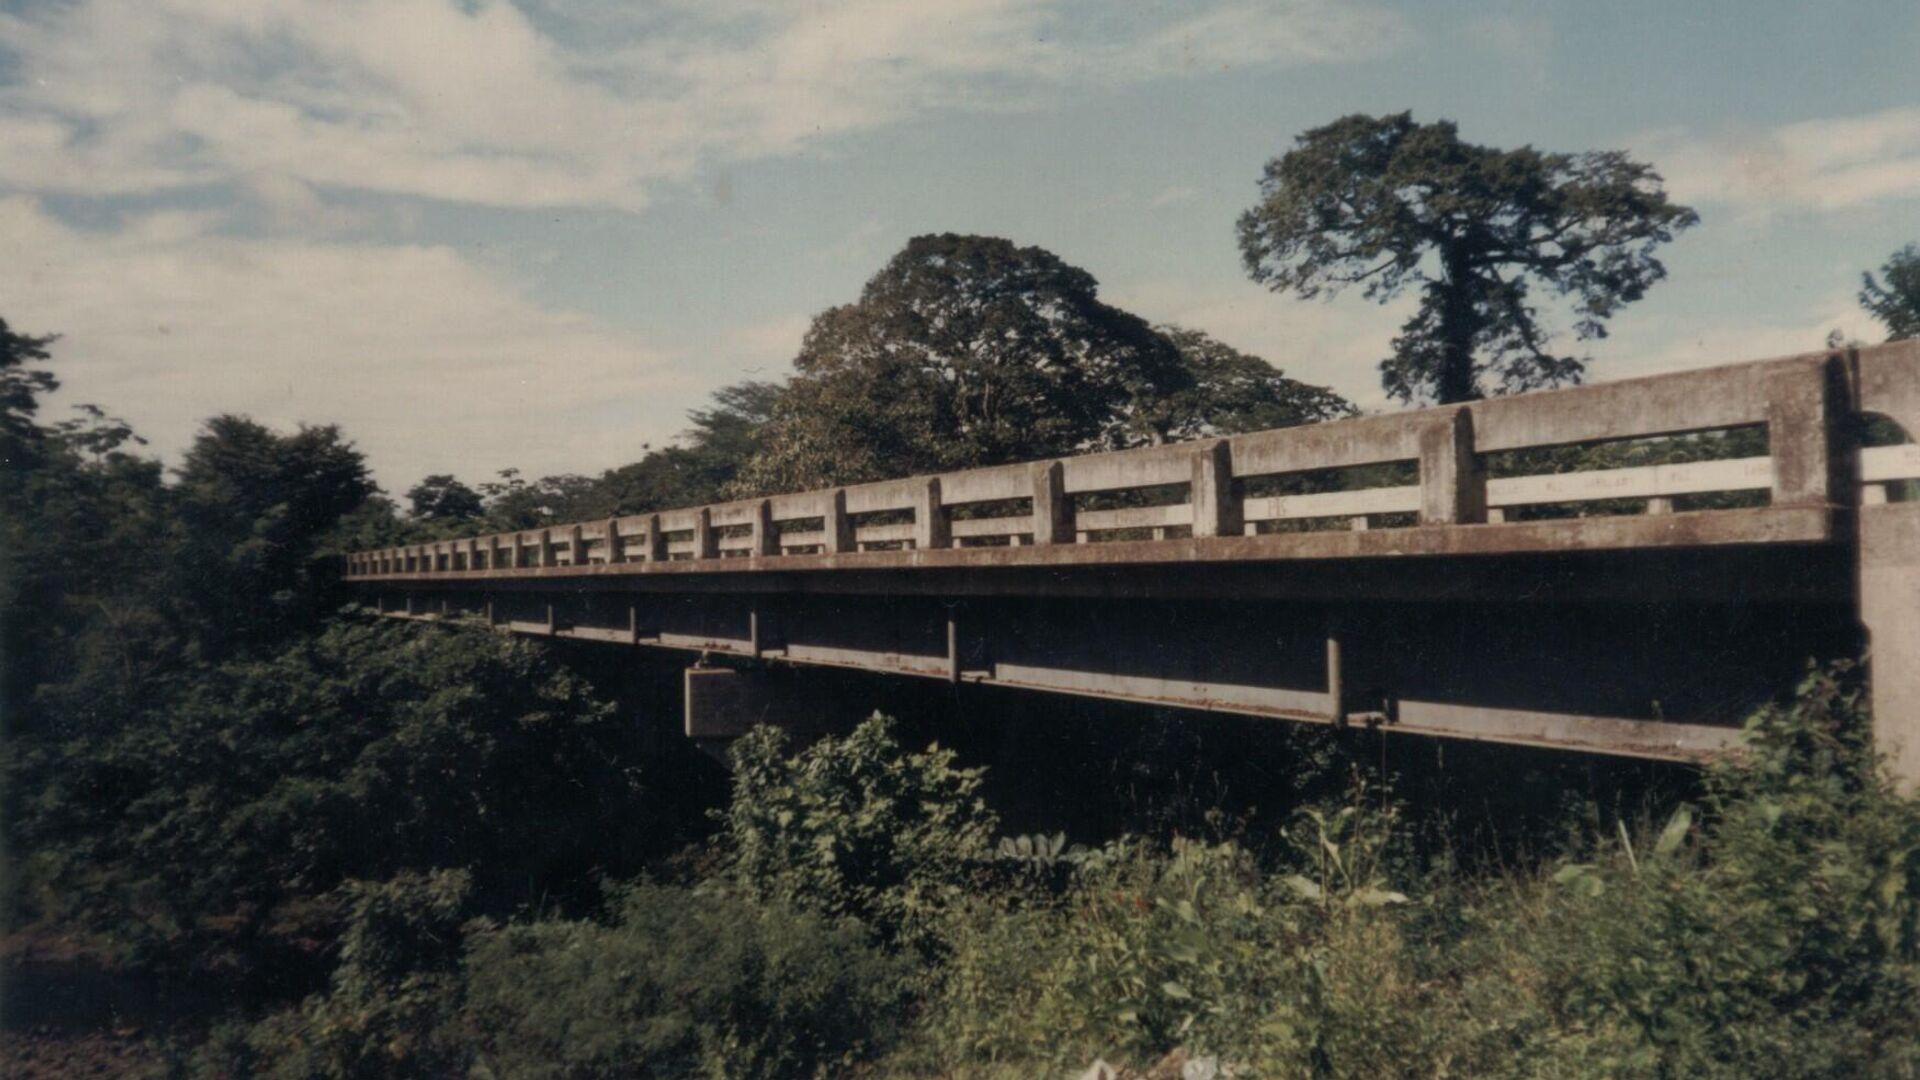 Un puente (imagen referencial) - Sputnik Mundo, 1920, 10.06.2021